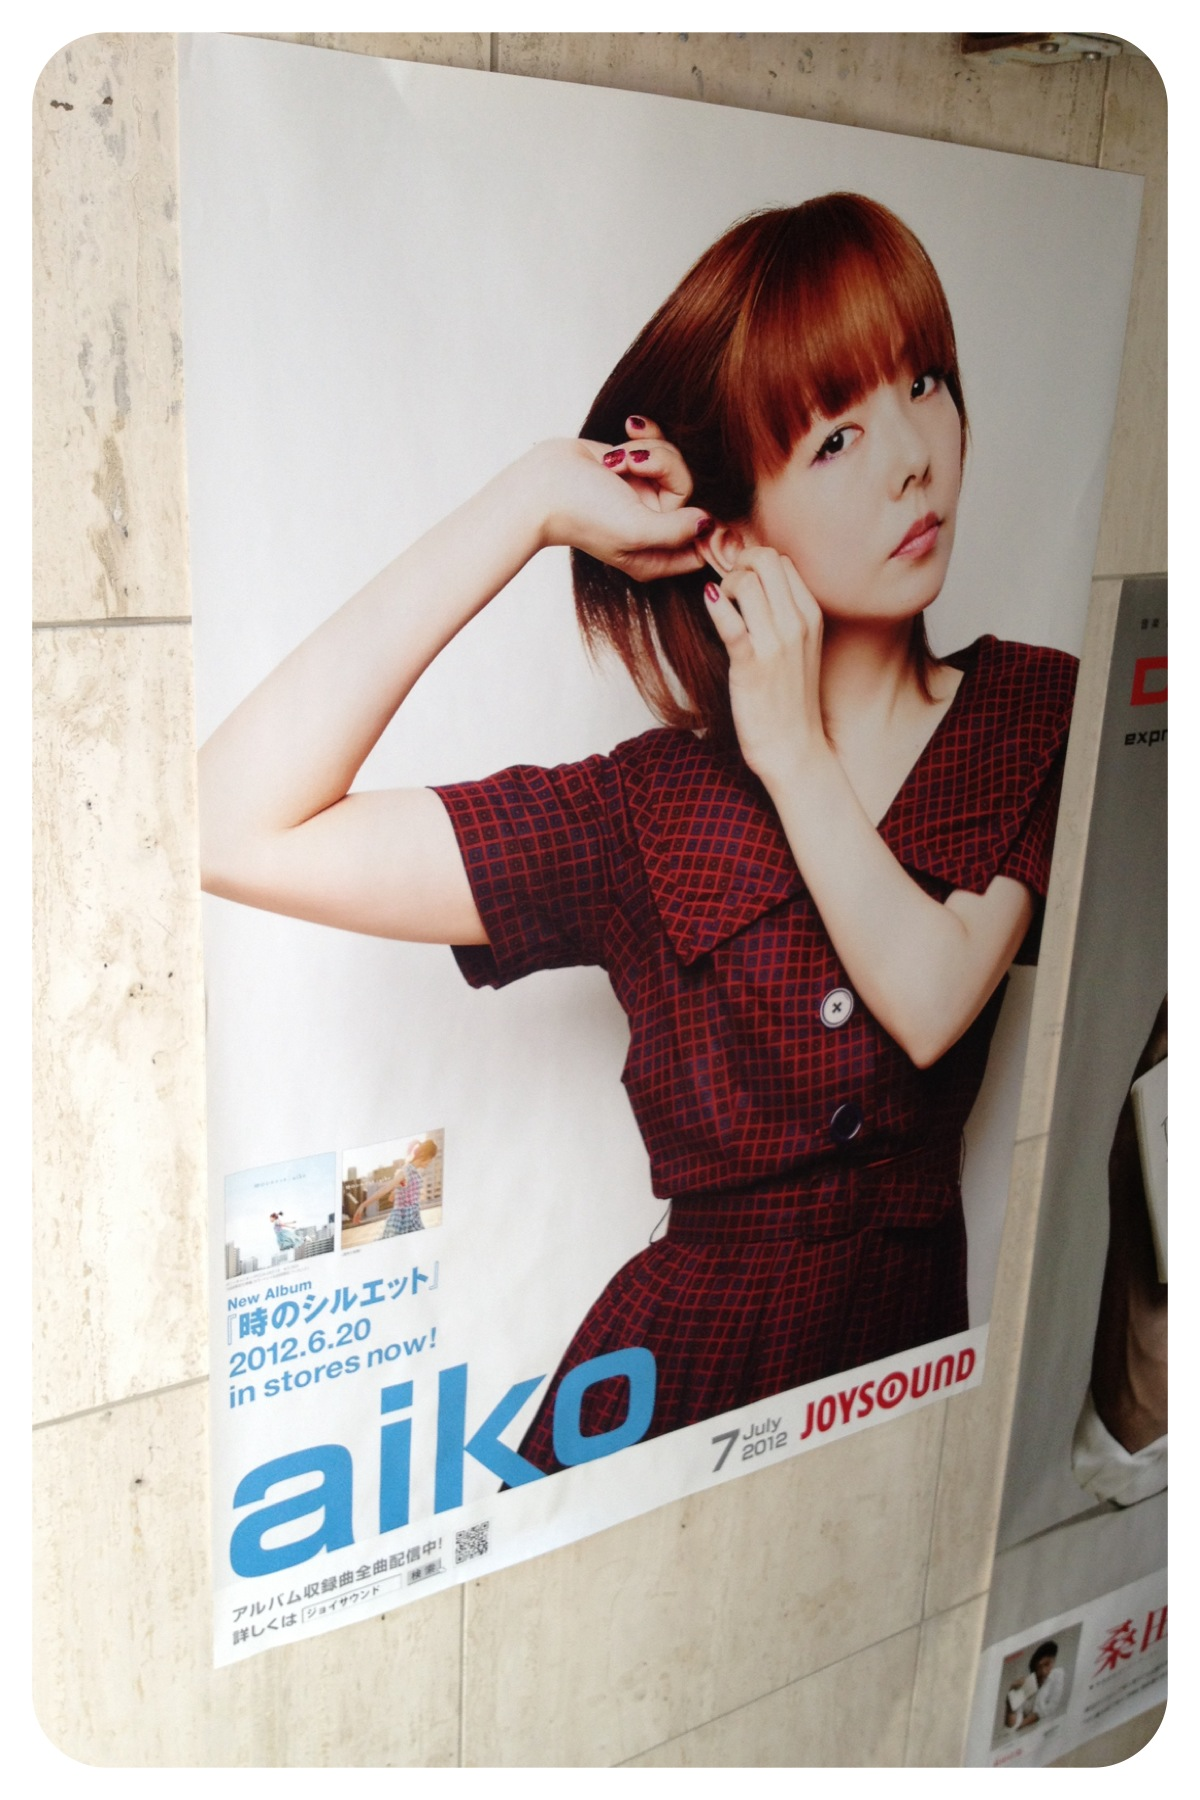 aiko_joysound.jpg